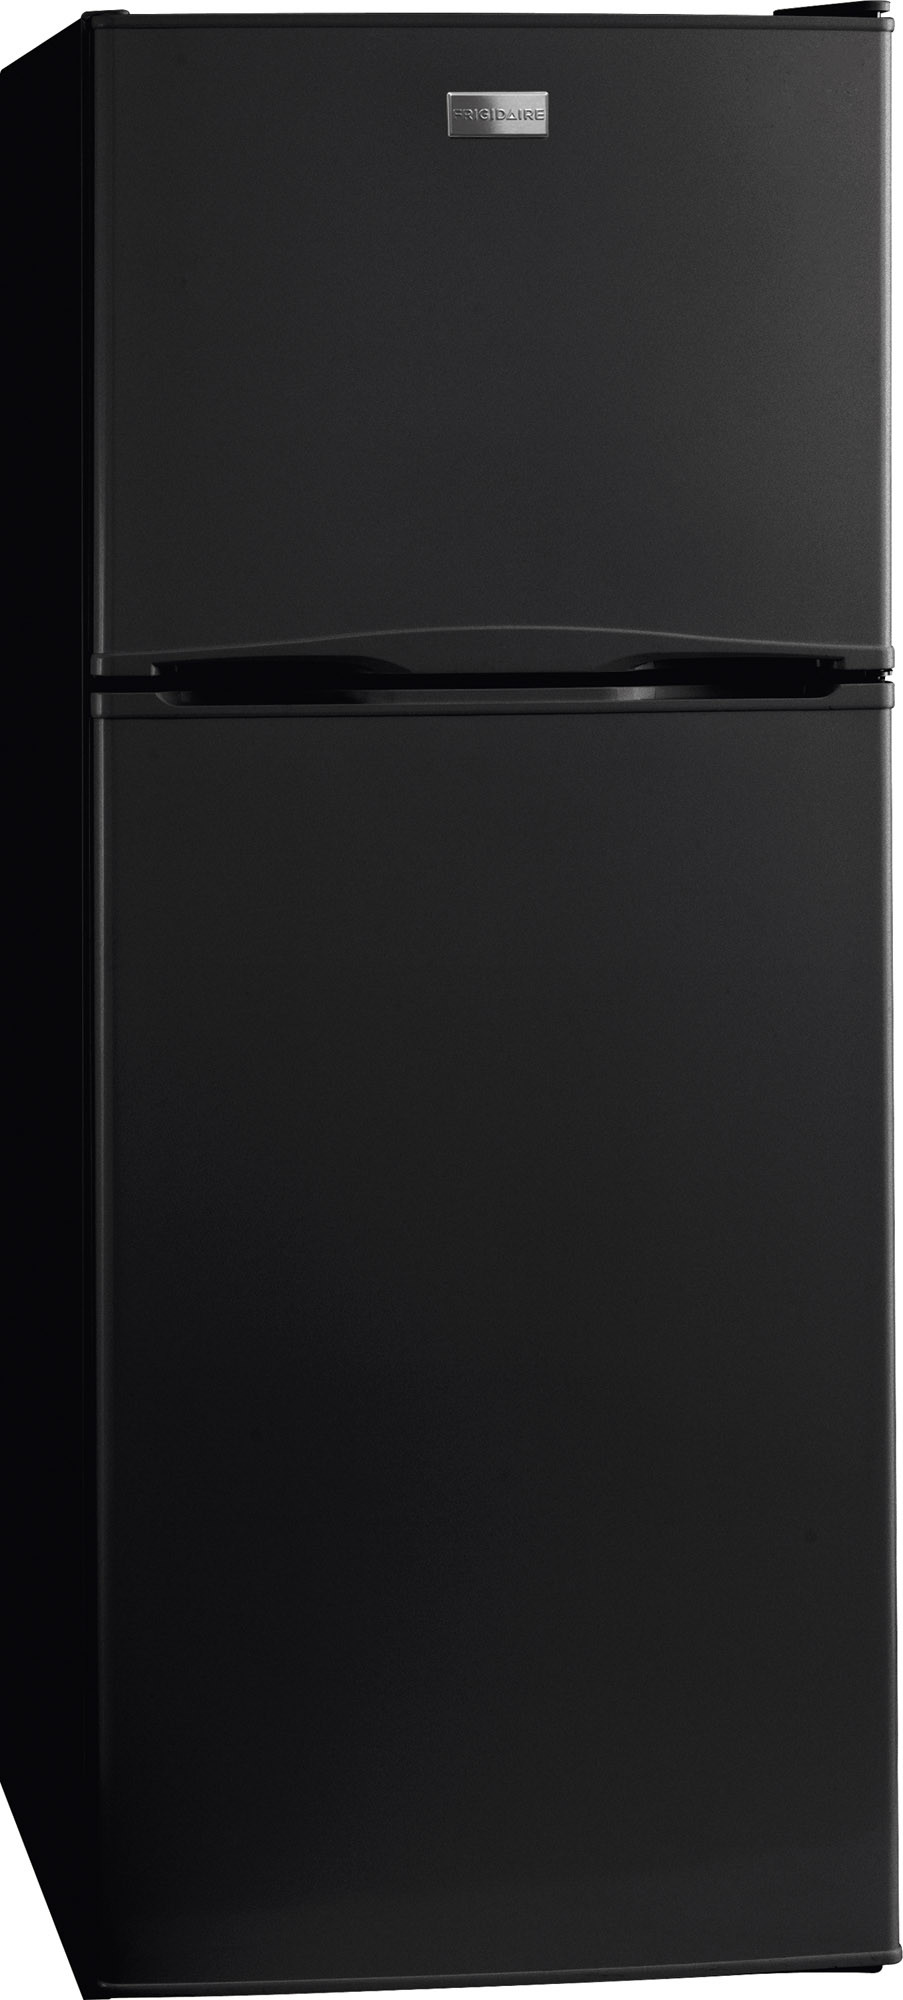 Side by side refrigerator 30 inch width - Side By Side Refrigerator 30 Inch Width 42